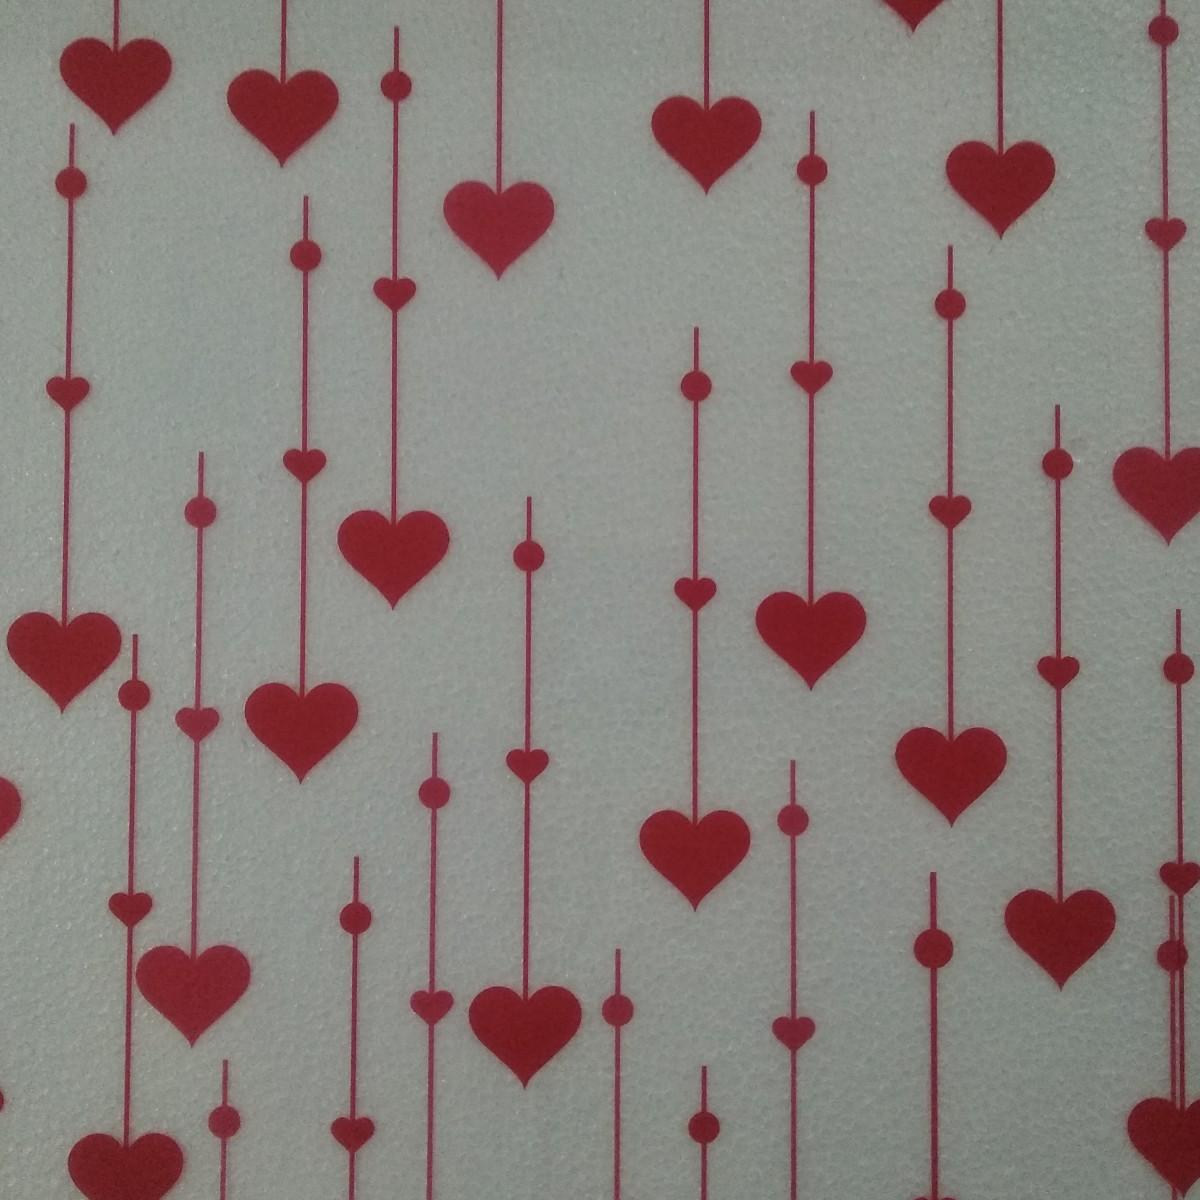 7062 Raining Hearts Red 80cmx25m 50mic Film - 1 Roll